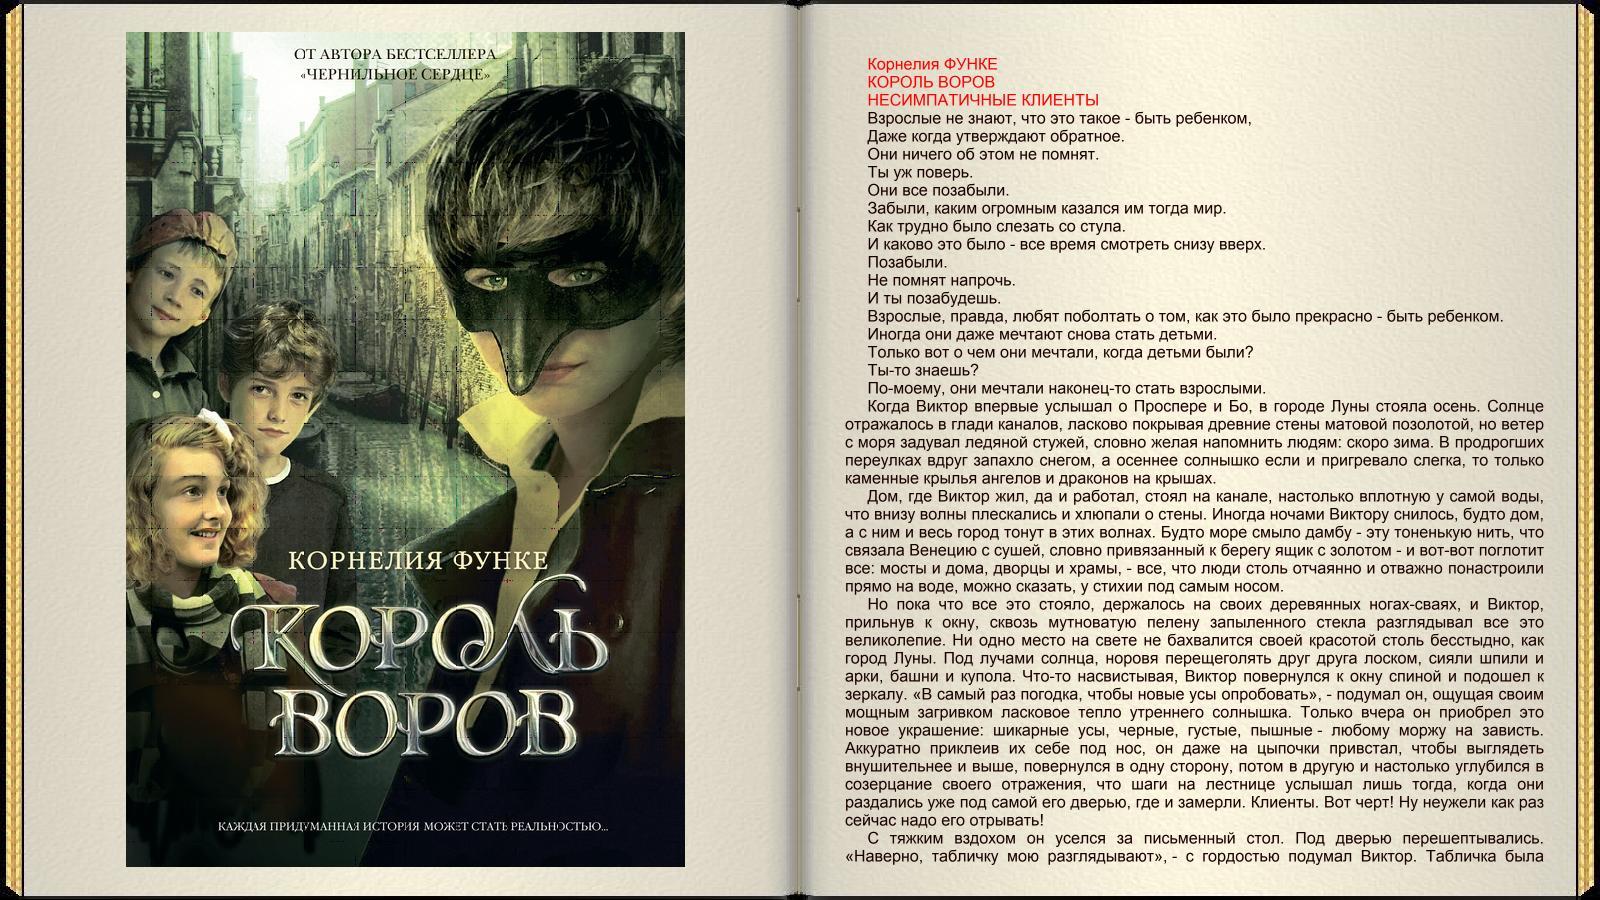 http://i2.imageban.ru/out/2016/02/01/ad2e90b0c3d5c129c6a34951012ae590.jpg